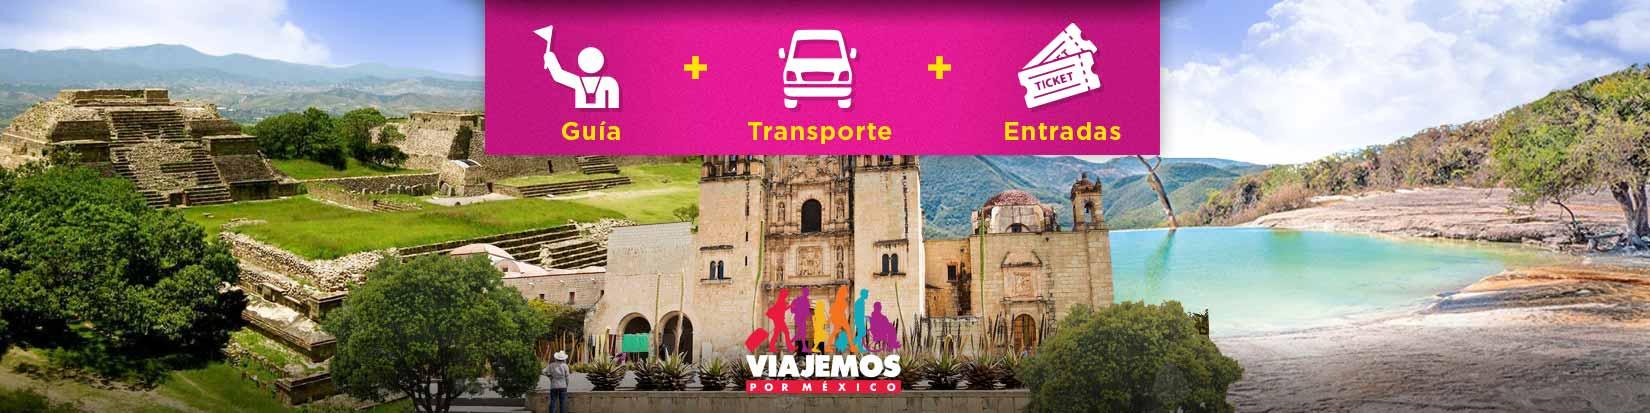 Tours / Excursiones en Oaxaca de hasta 10 hrs